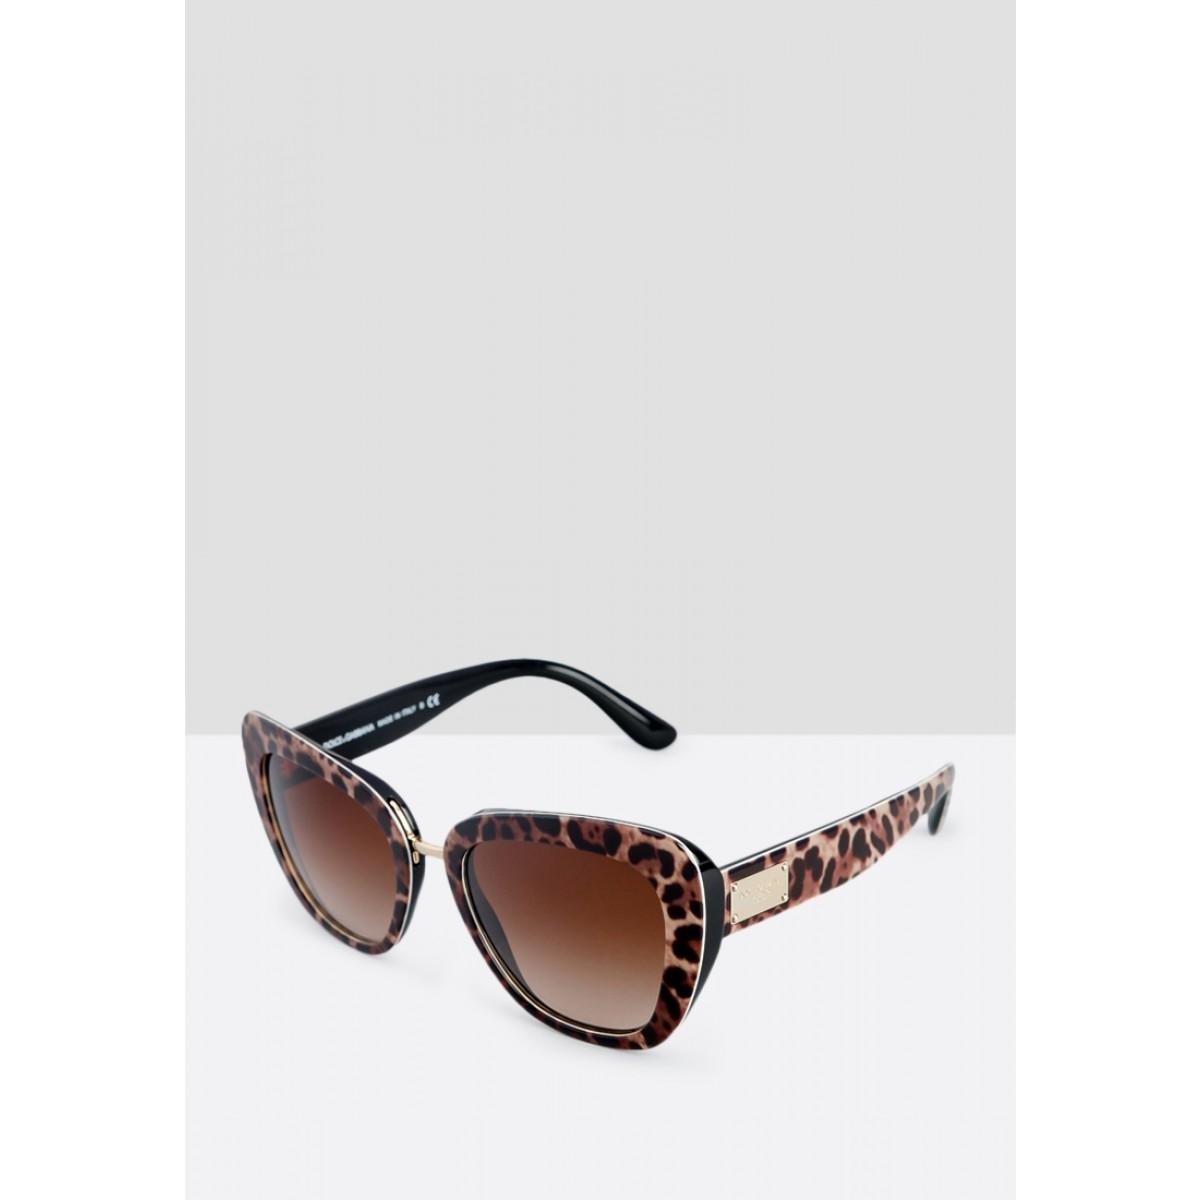 765f440370f5 Dolce & Gabbana Leopard Print Cateye Women Sunglasses DG4296-199513-53 -  Sunglasses - Fashion World